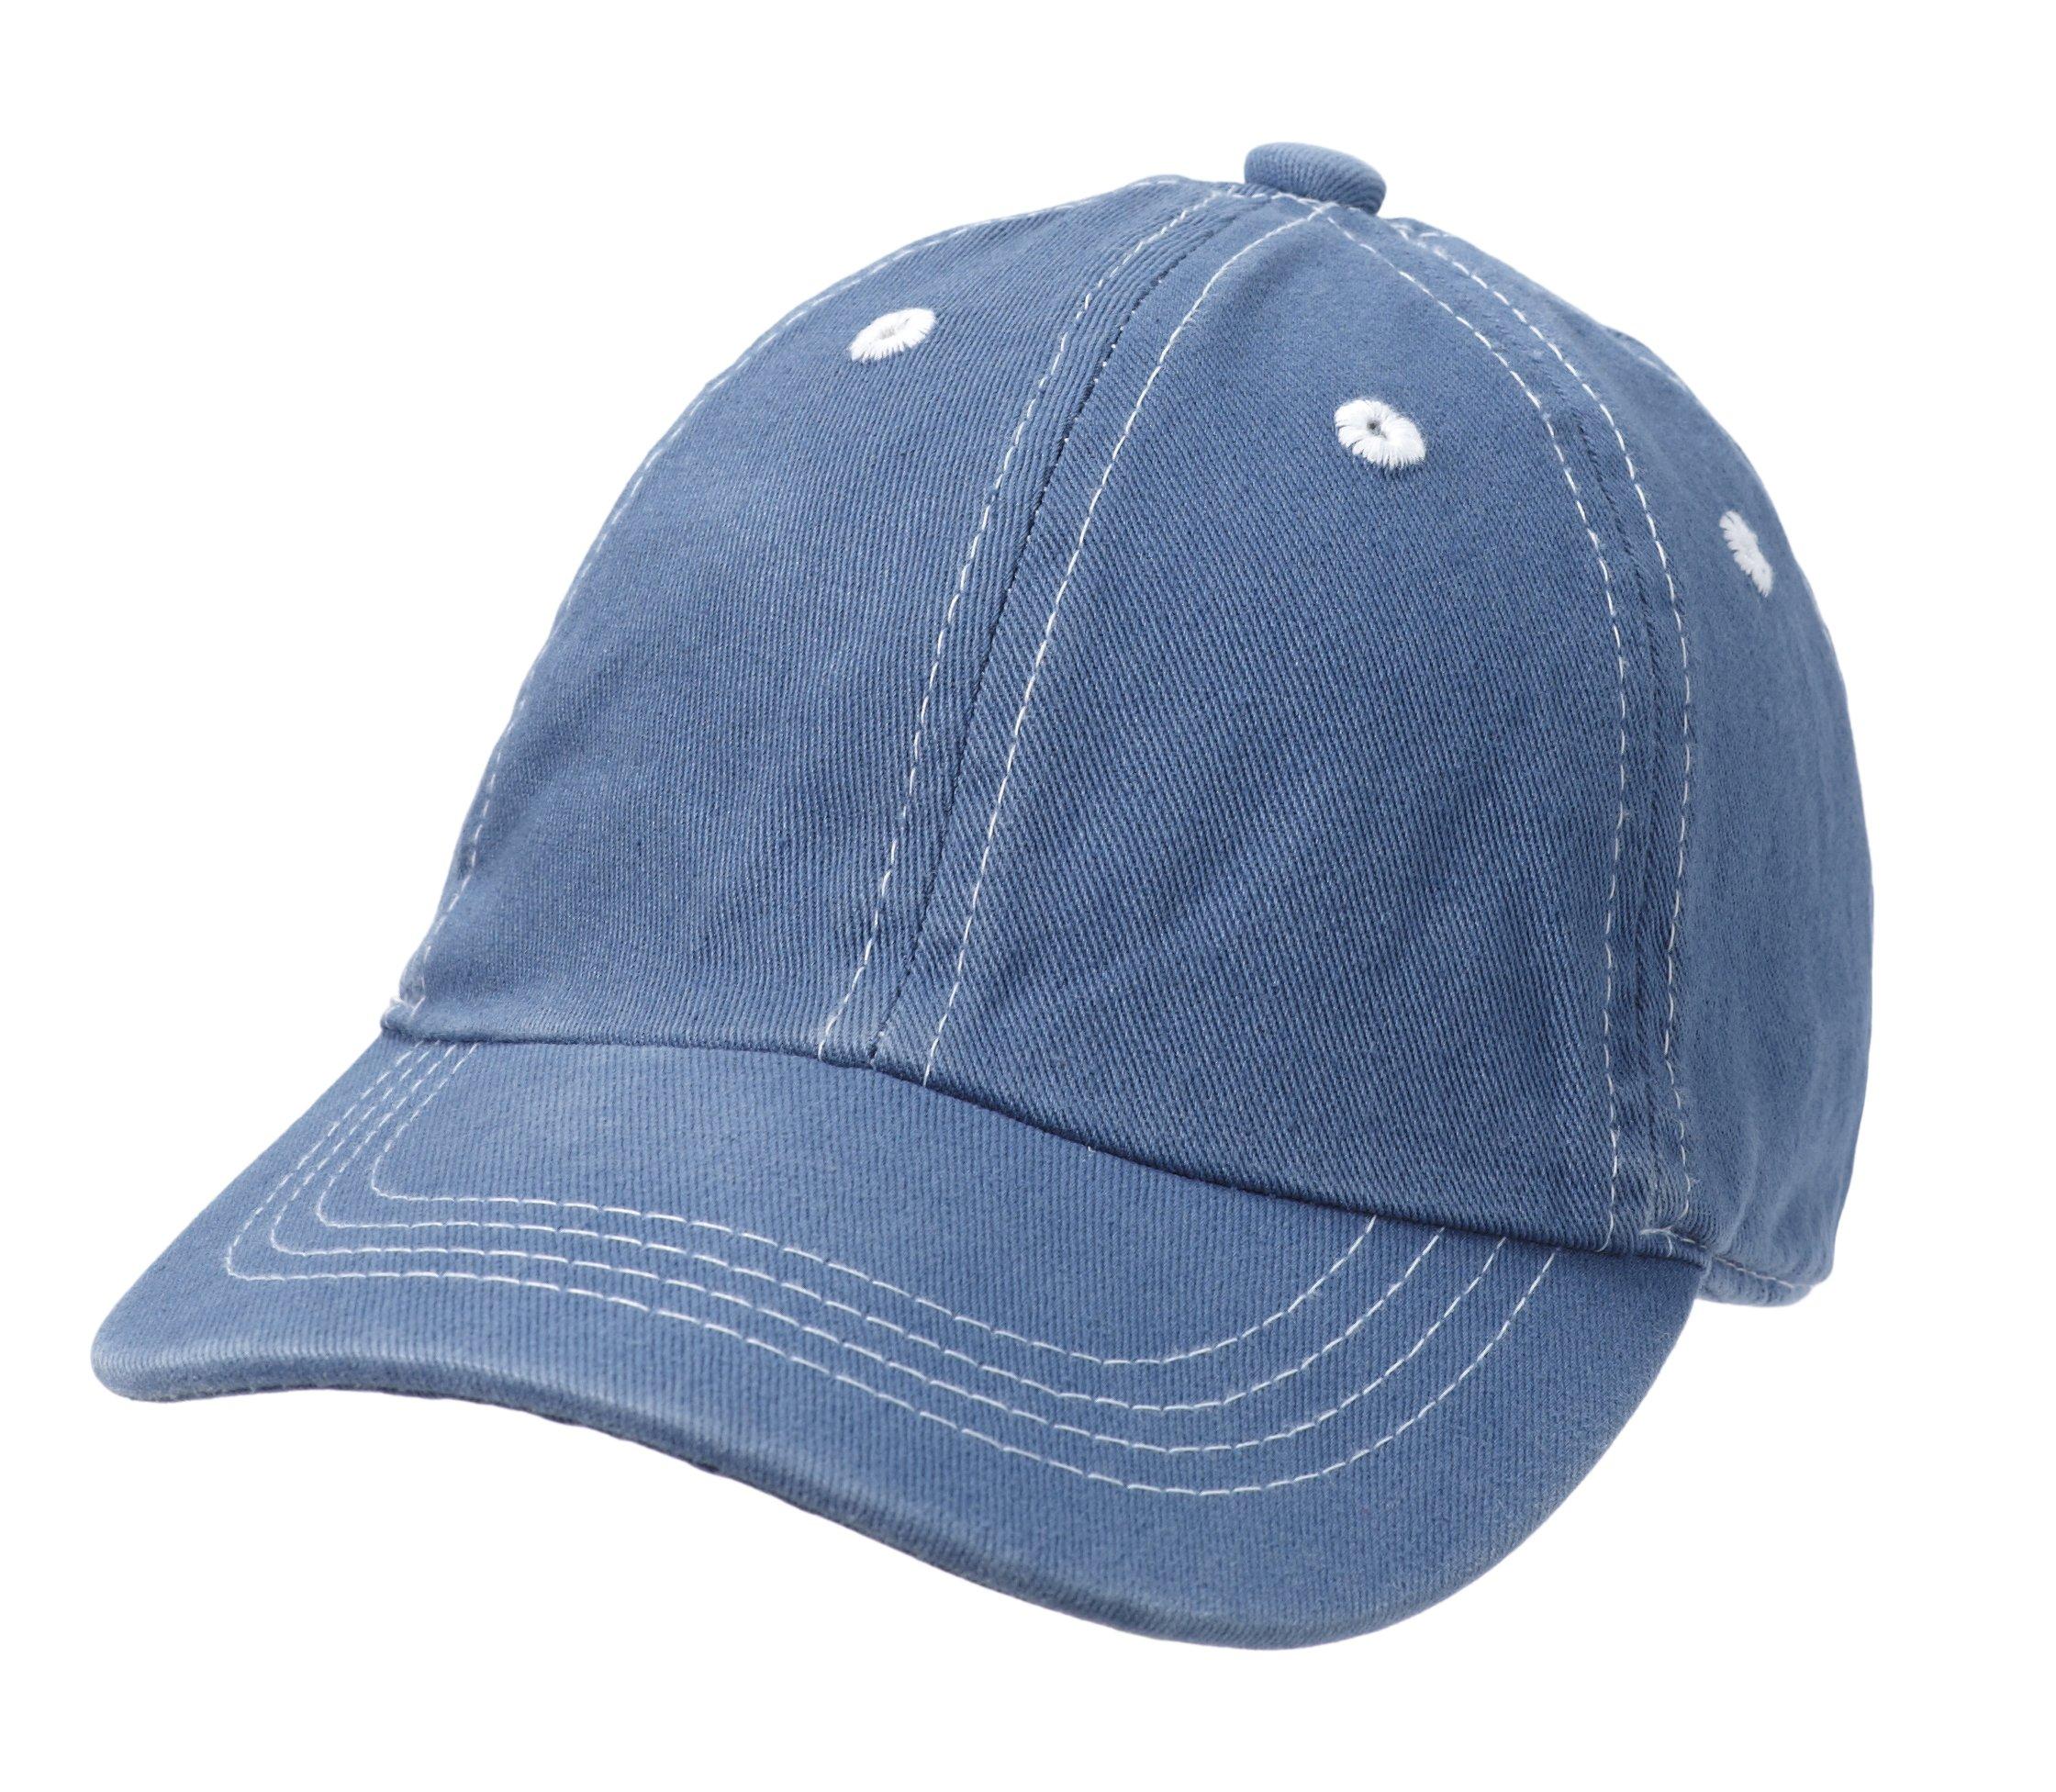 City Thread Baby Solid Baseball Hat Sun Protection SPF Beach Summer - Denim Blue - M(6-18M)